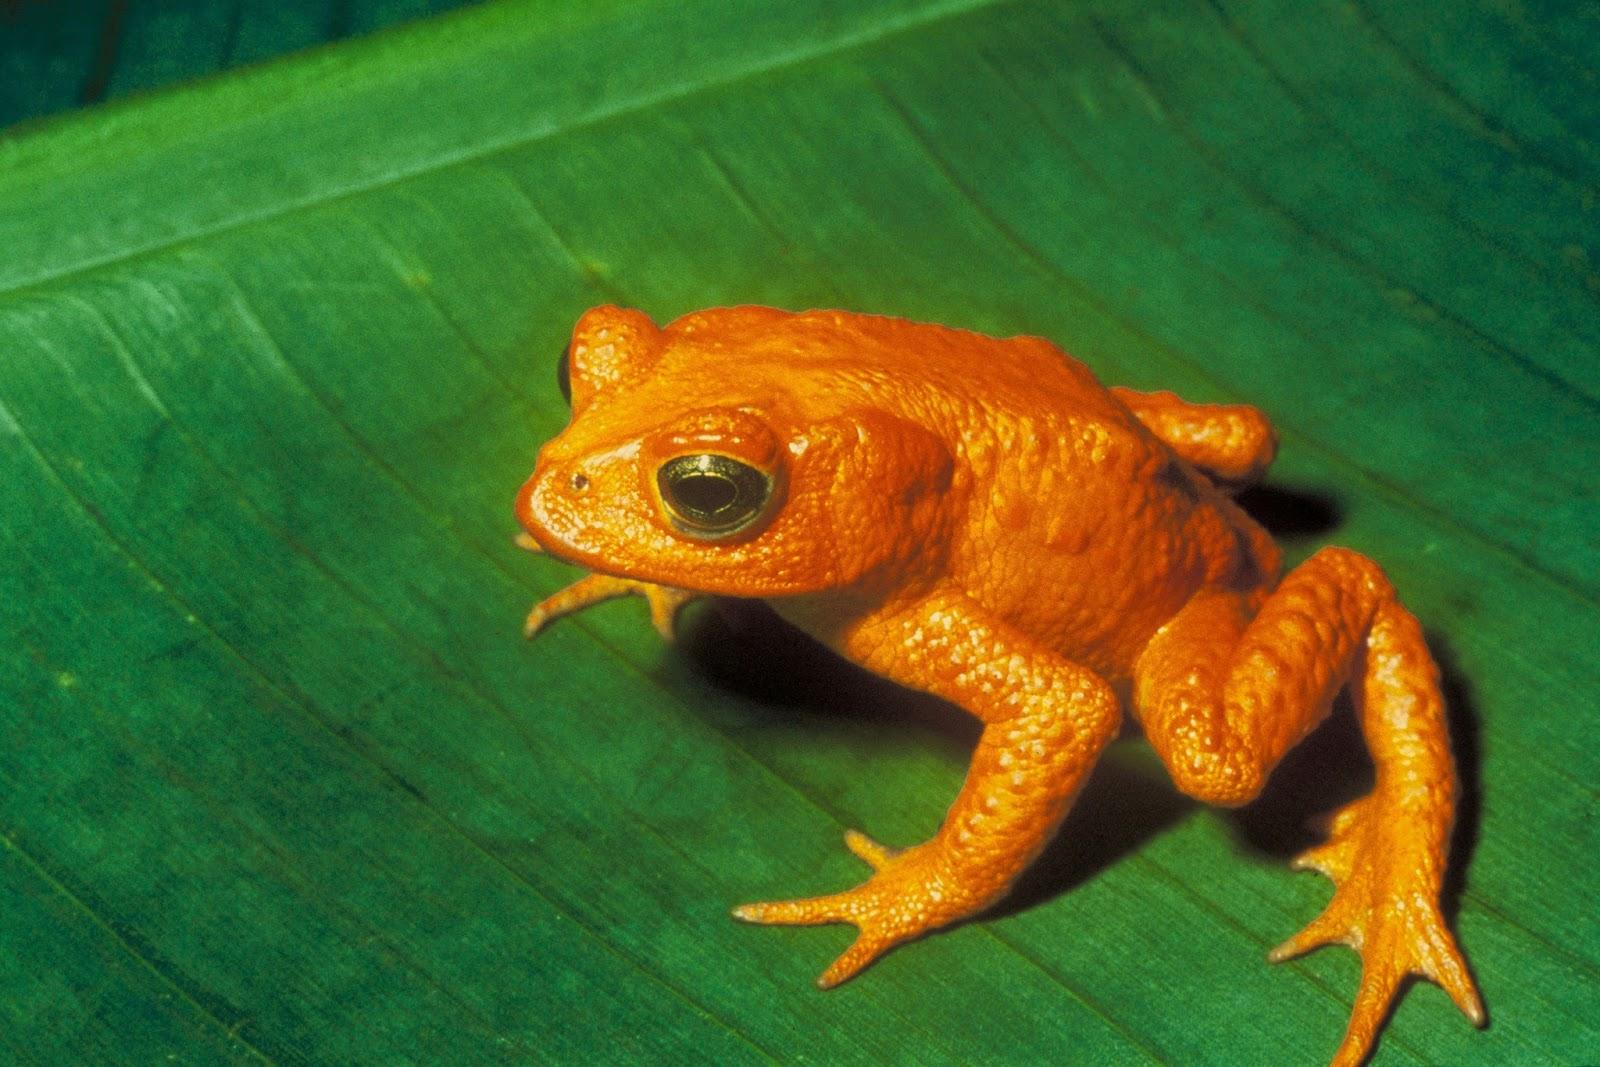 Amphibians: Bufo periglenes